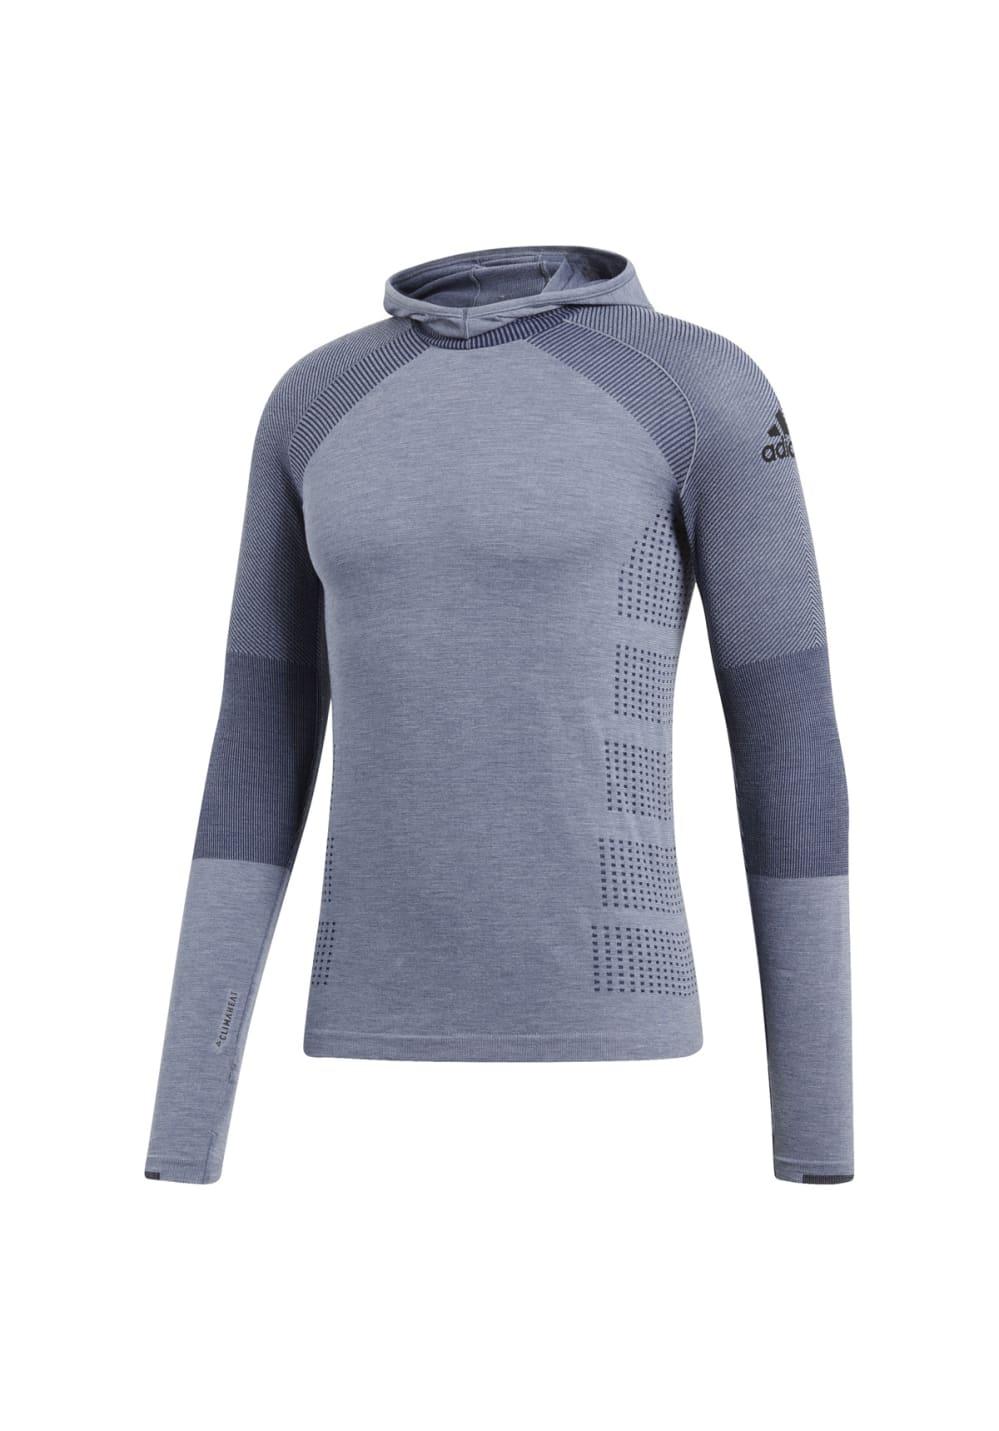 adidas Climaheat Primeknit Long Sleeve Hoody - Laufshirts für Herren - Grau, Gr